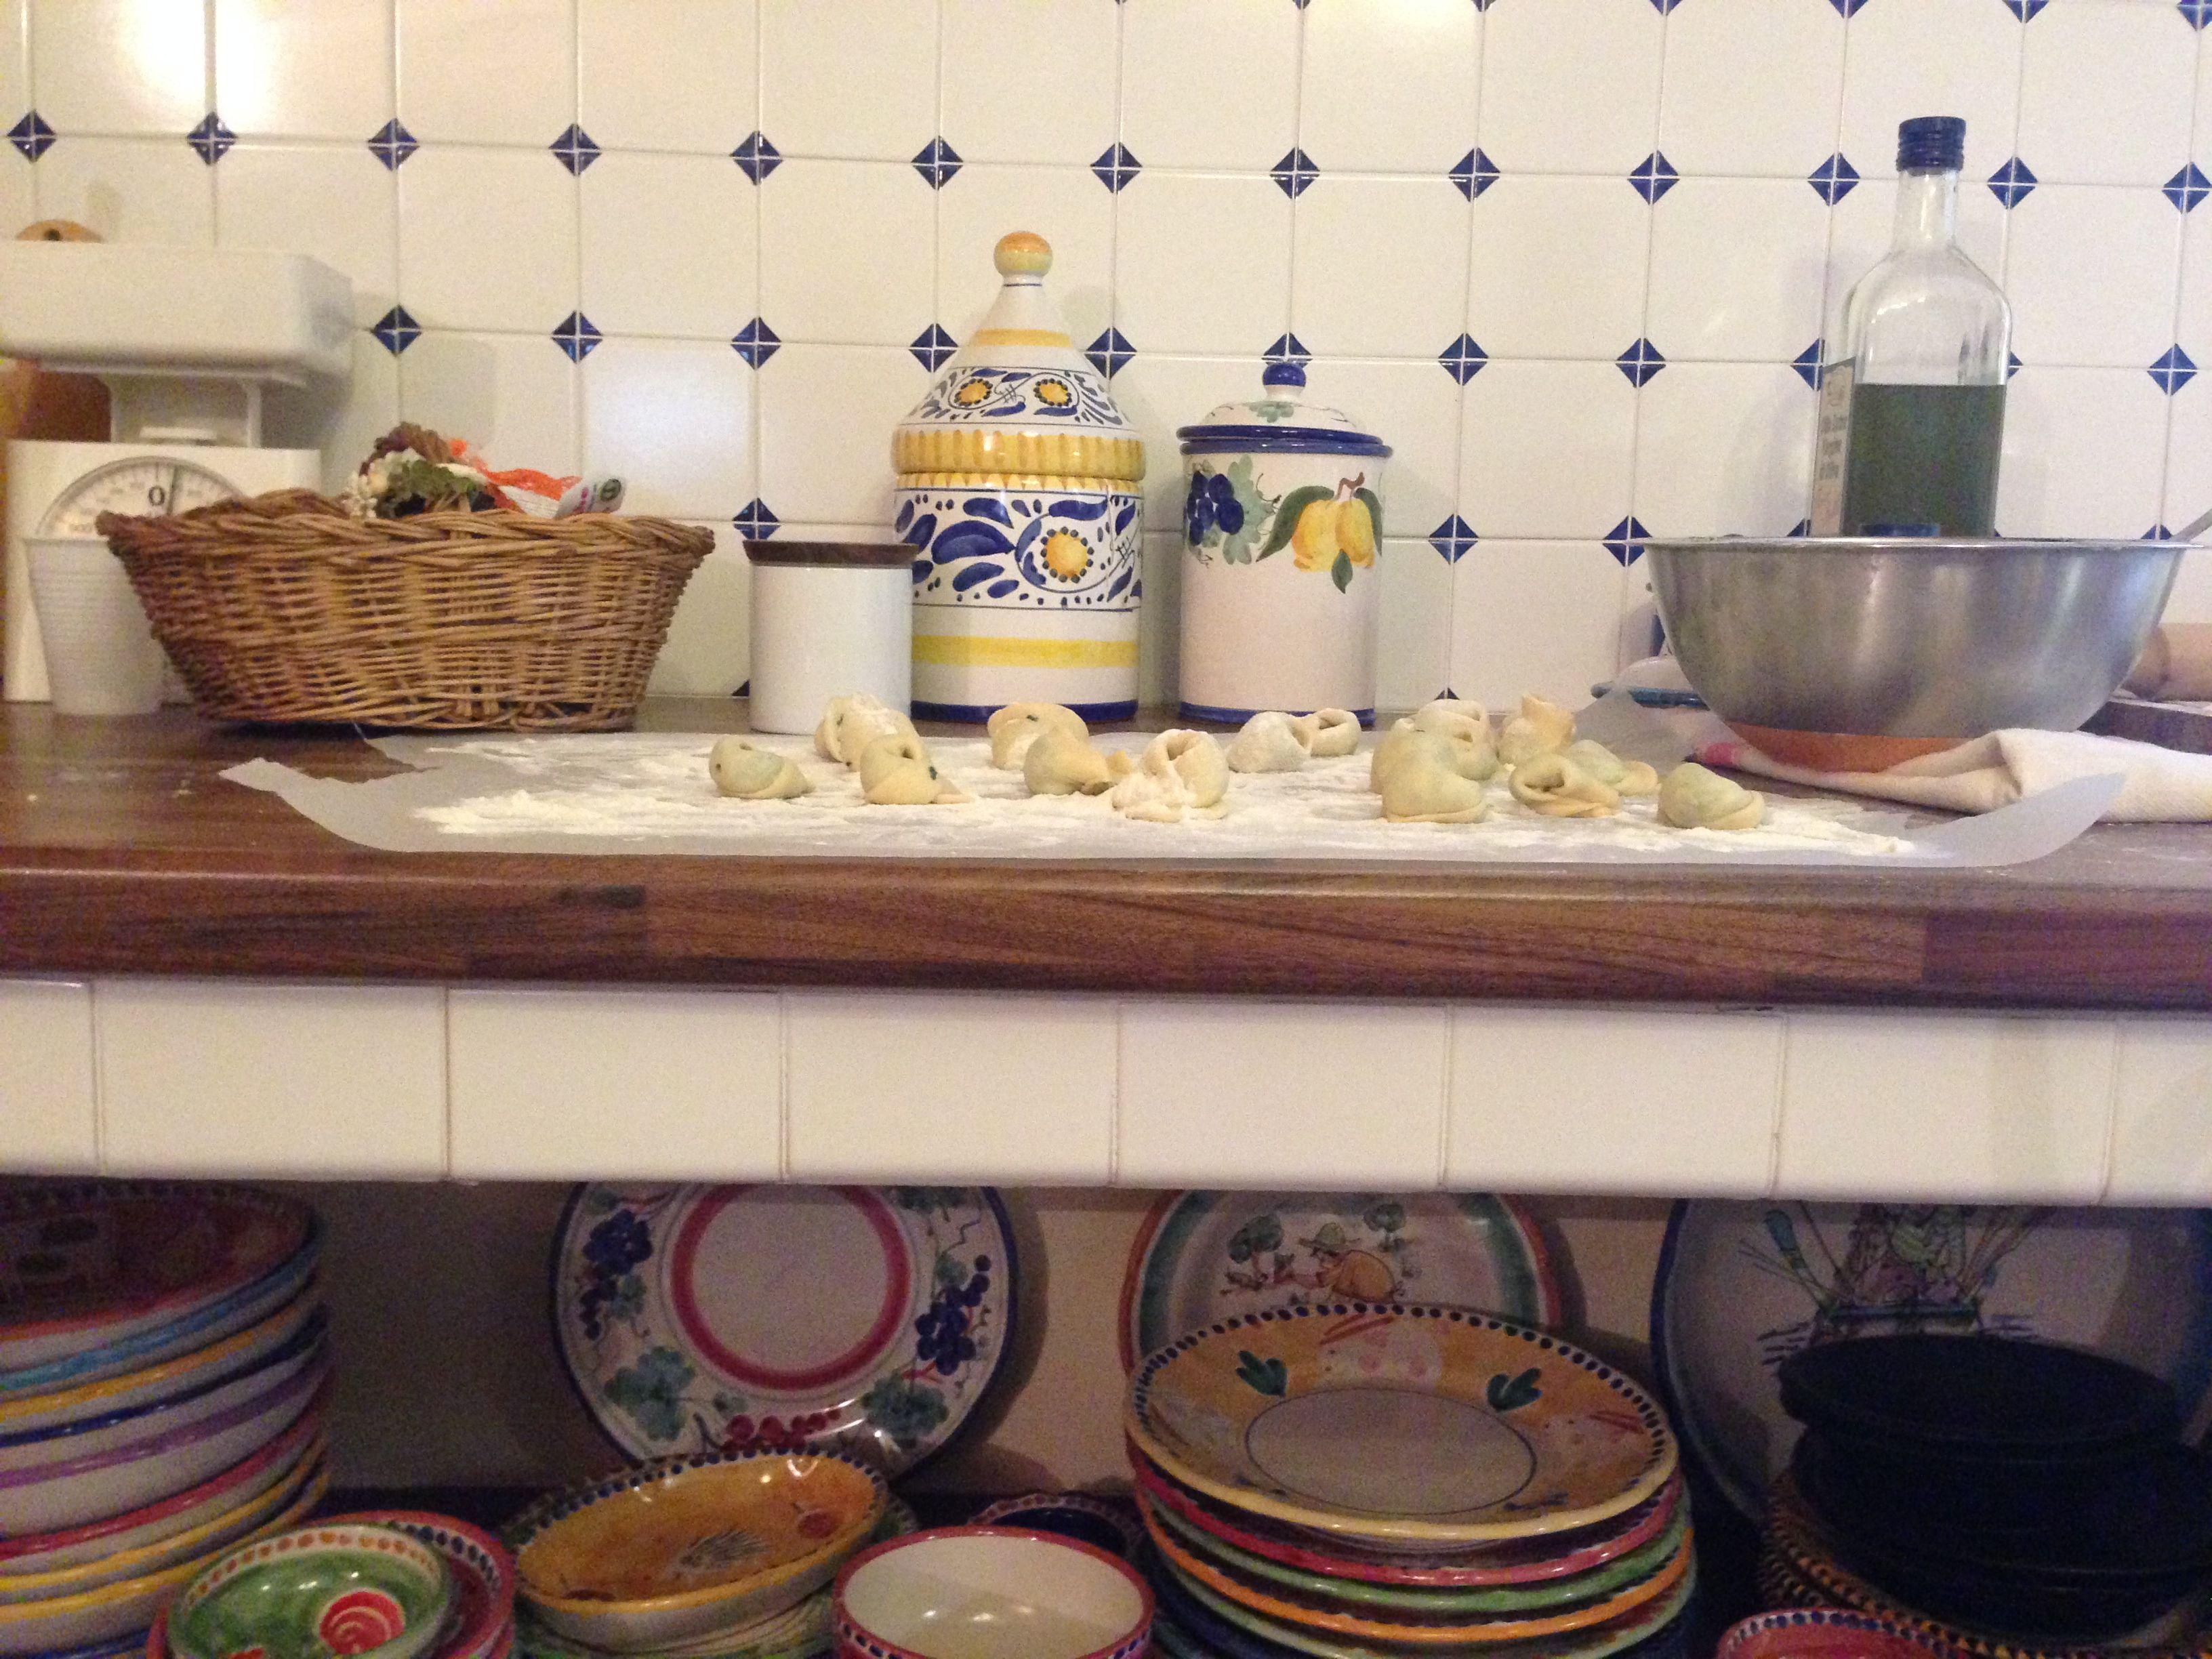 old recipes, old crockery